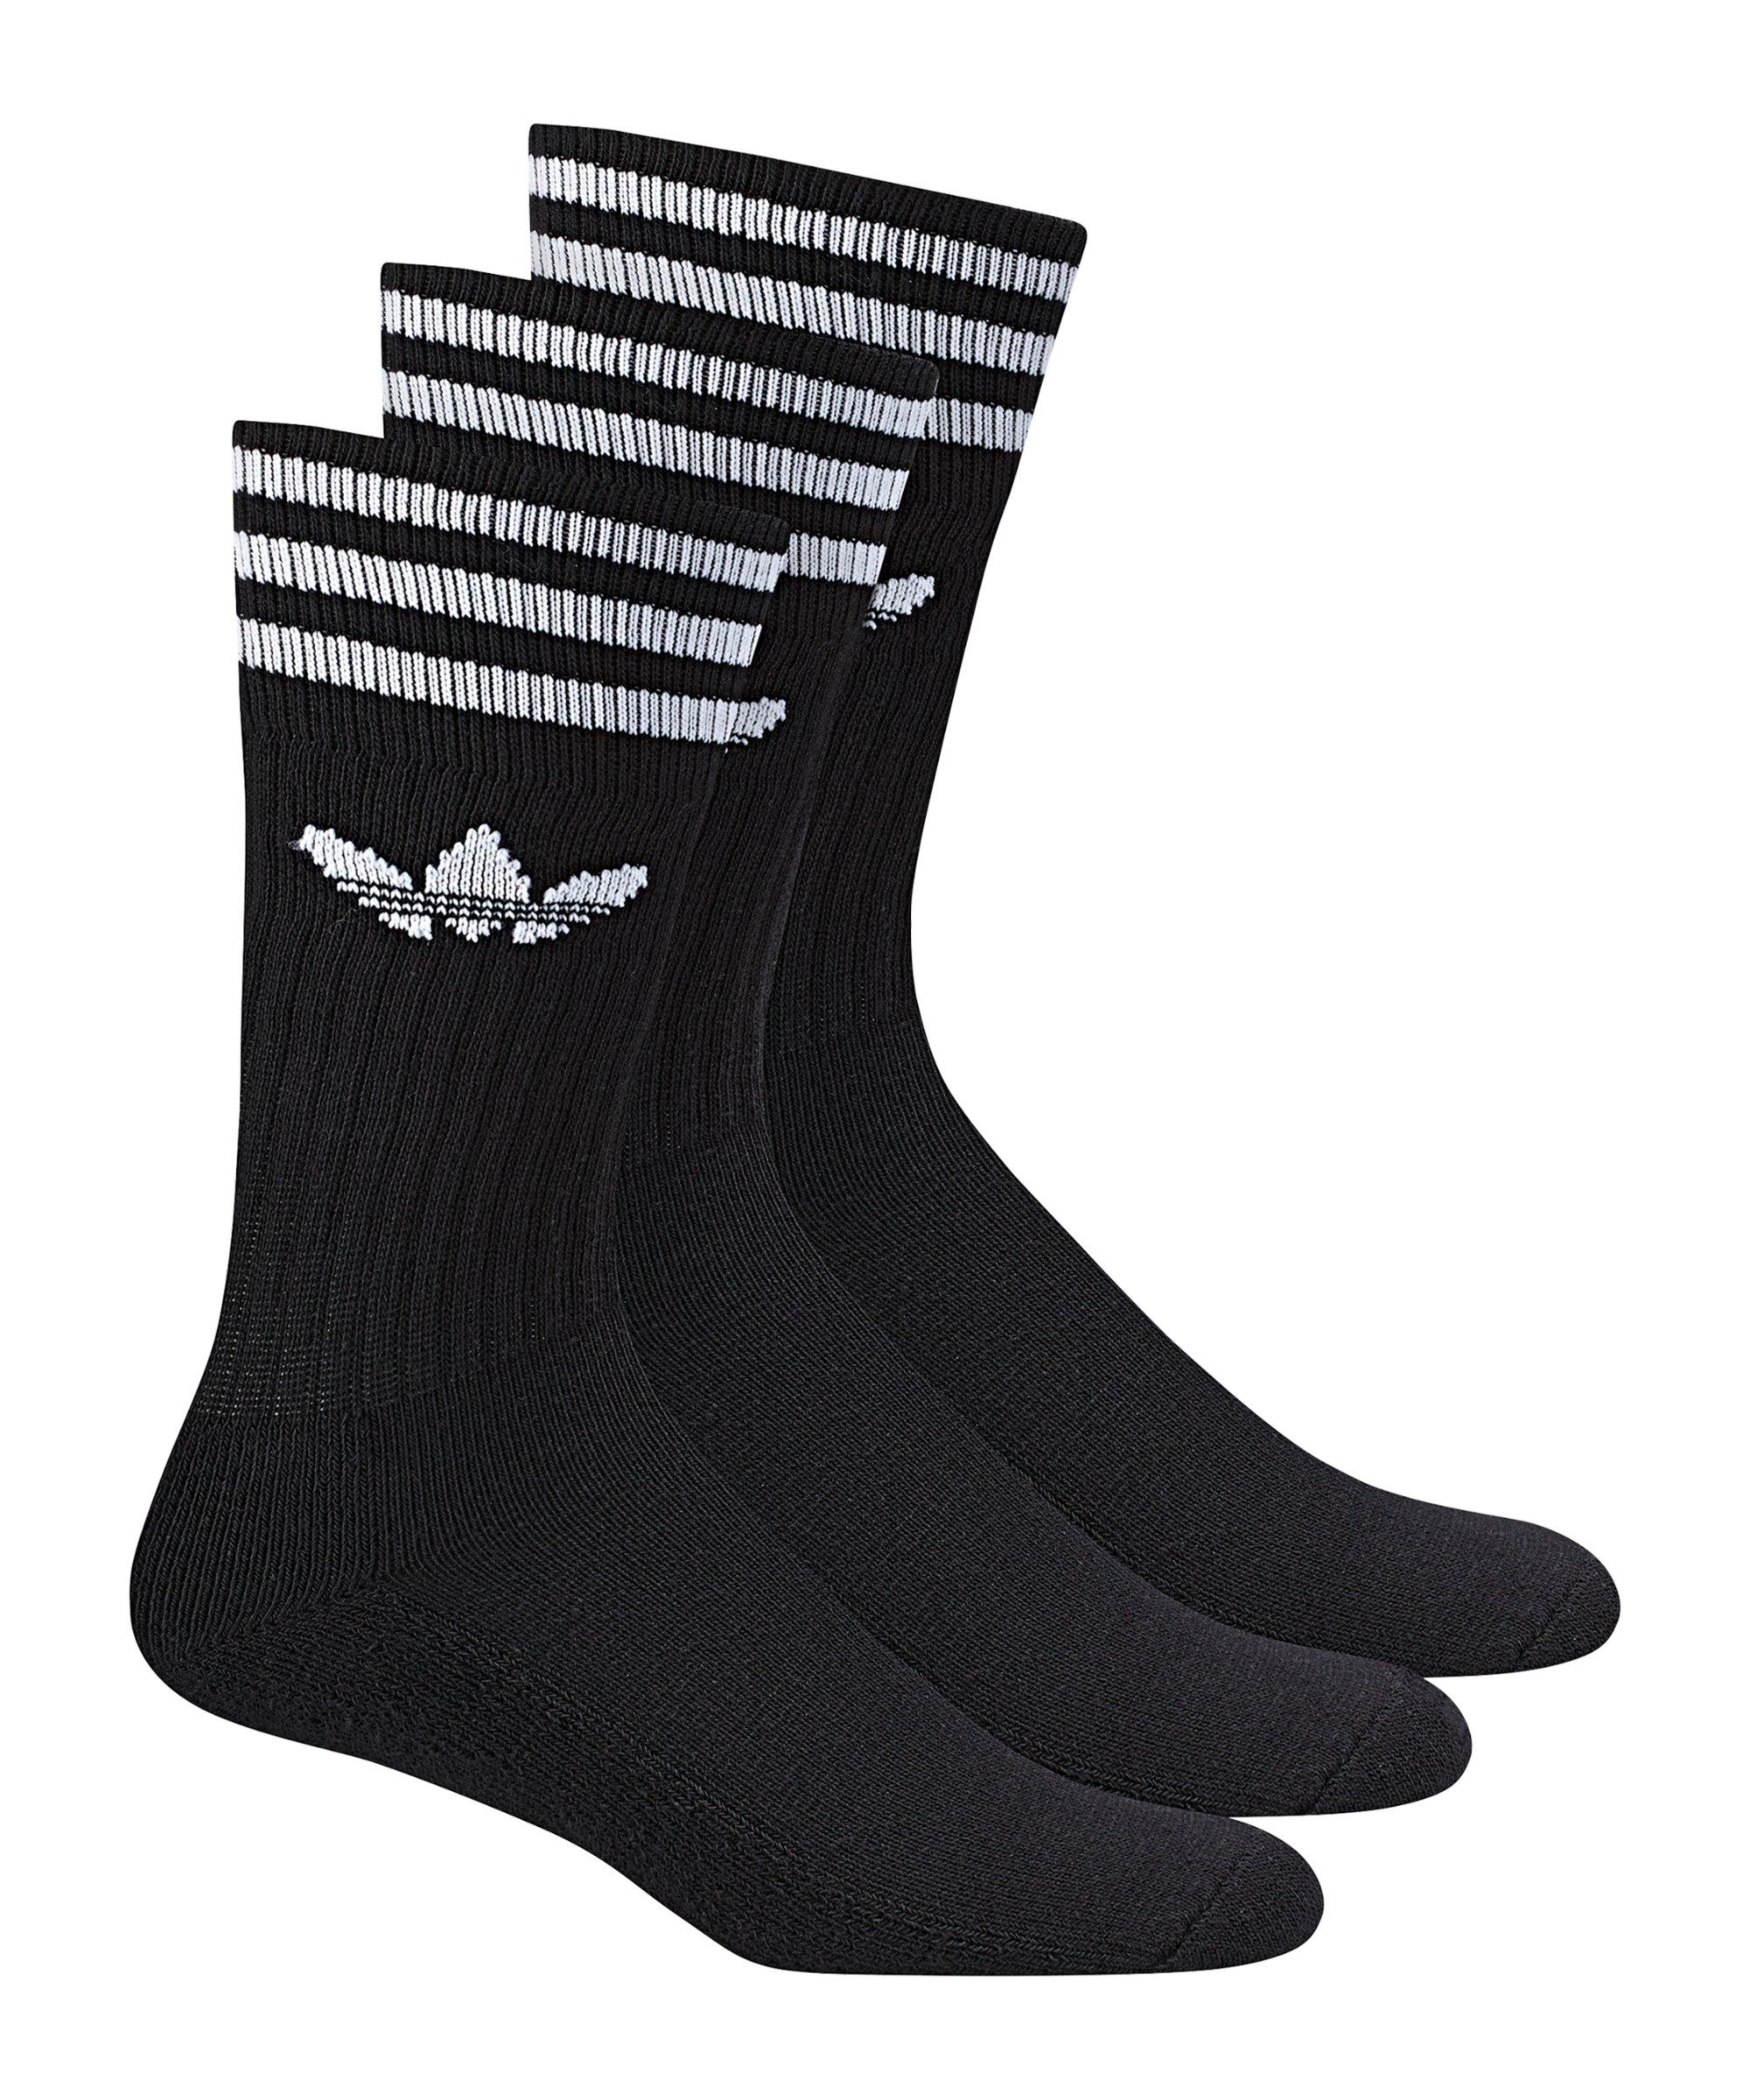 adidas solid crew socken 3er pack schwarz weiss socks. Black Bedroom Furniture Sets. Home Design Ideas